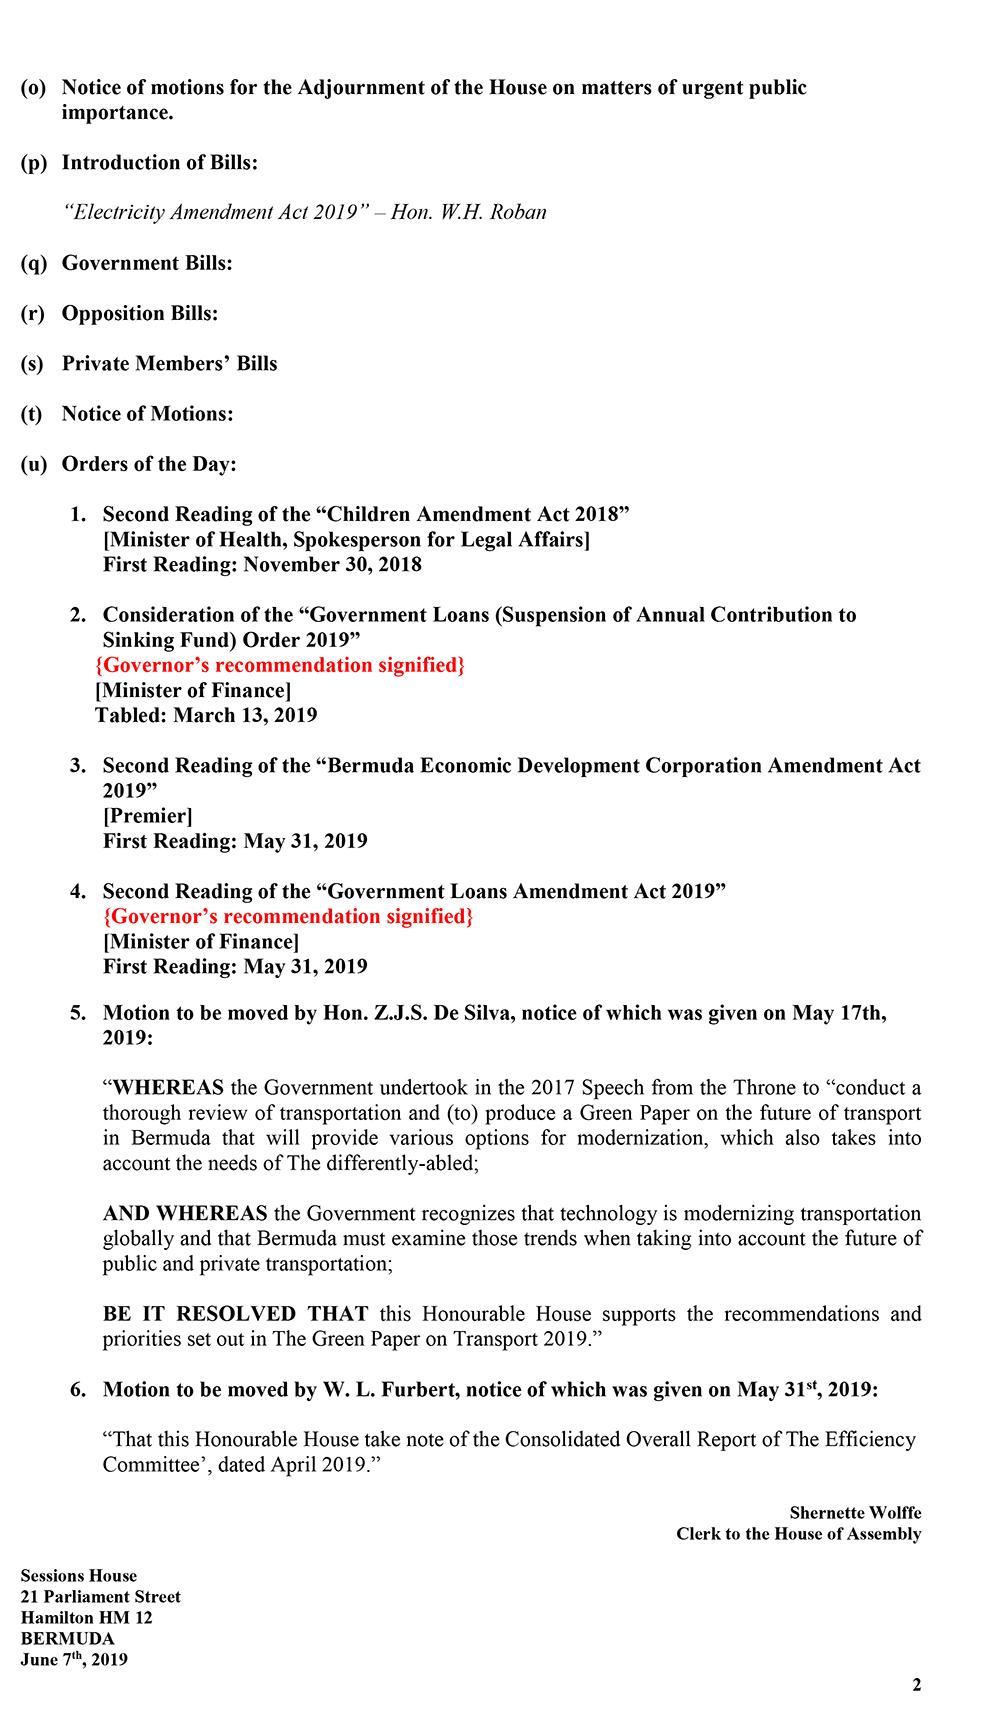 Order of Business Friday, June 7, 2019-2